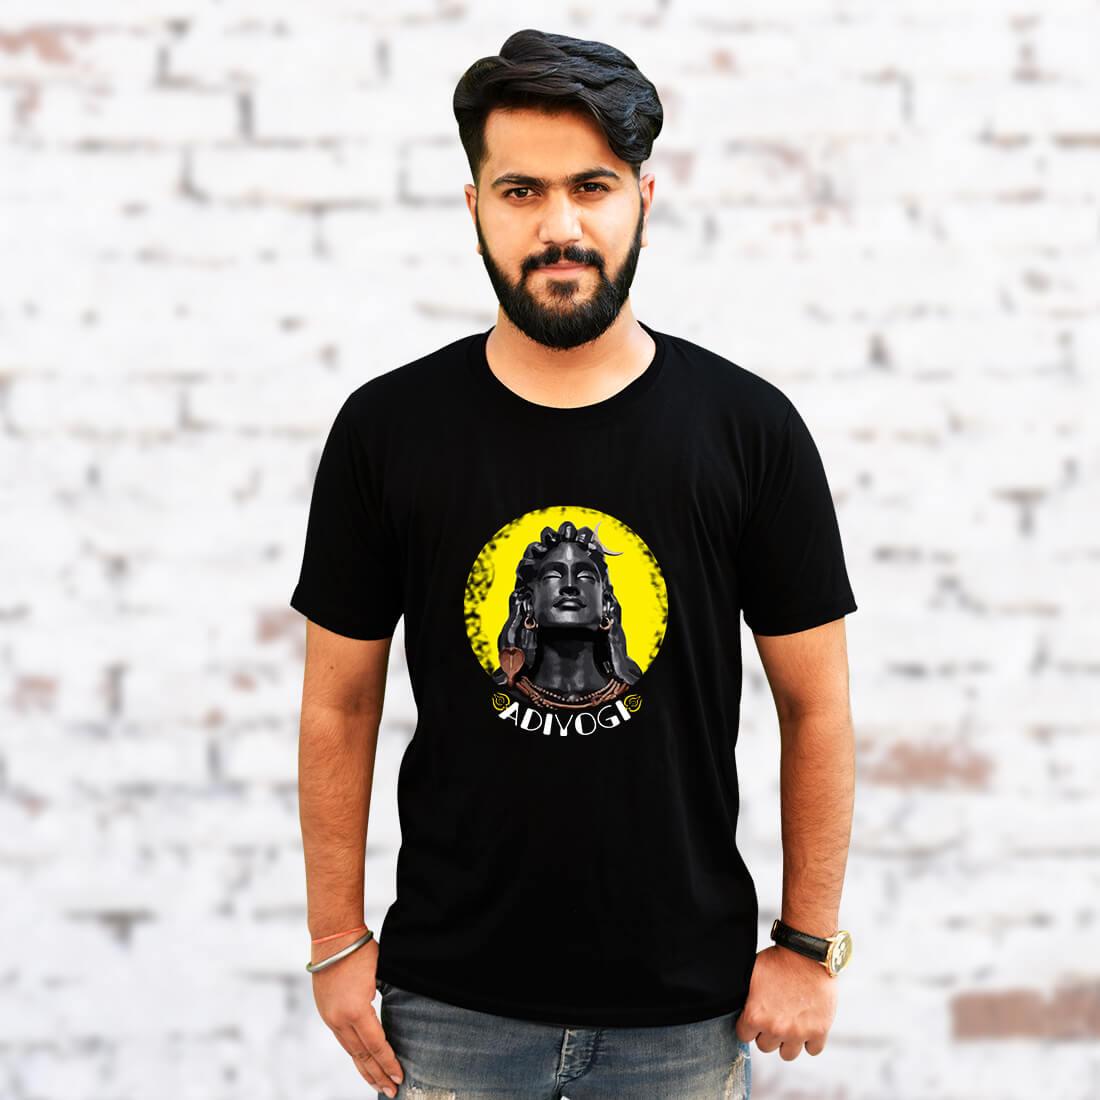 Adiyogi Best Images Printed Plain Black T Shirt